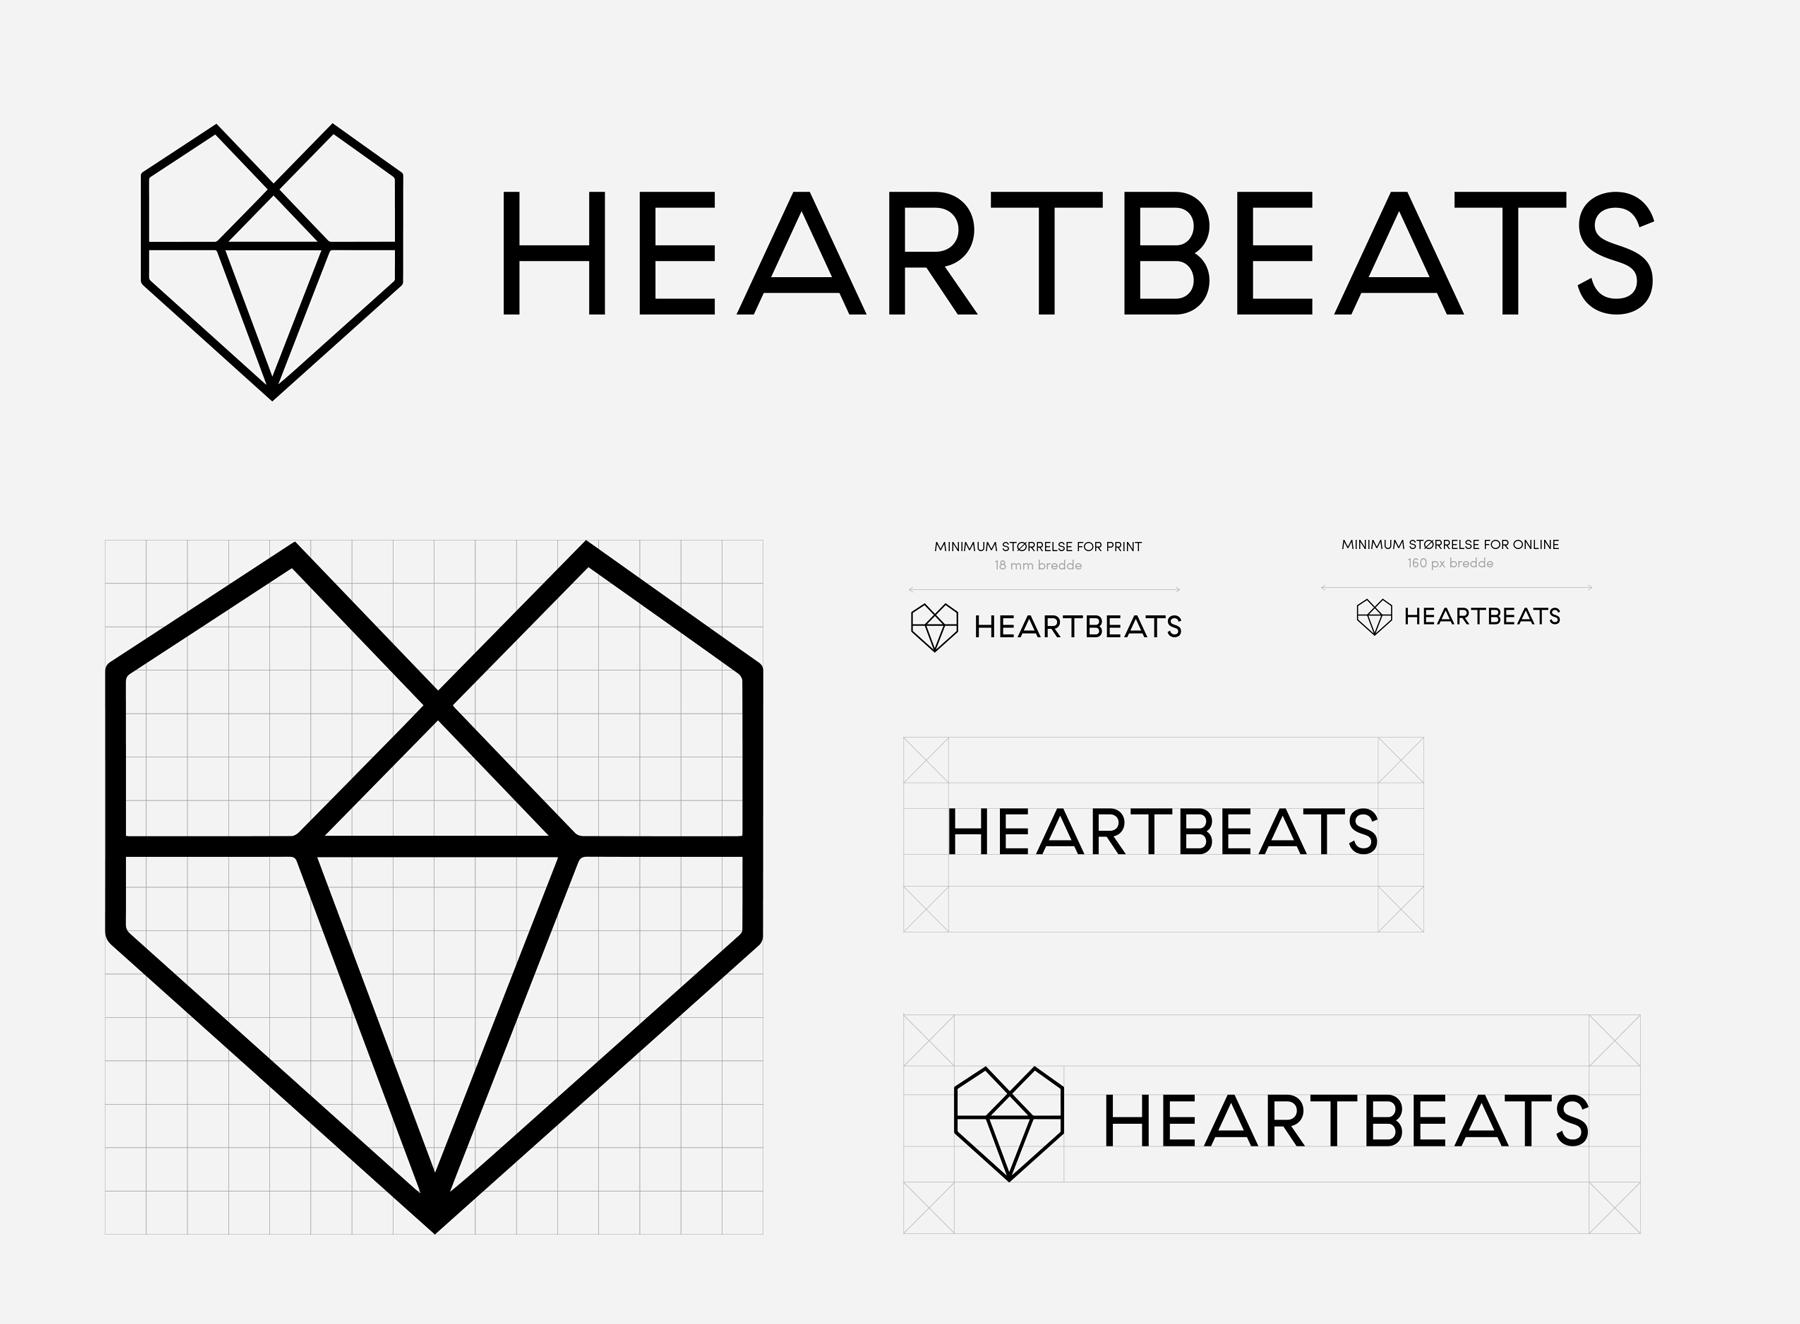 HEARTBEATS_Brand_Visuel_Identity__Fuhr_Studio_07.png